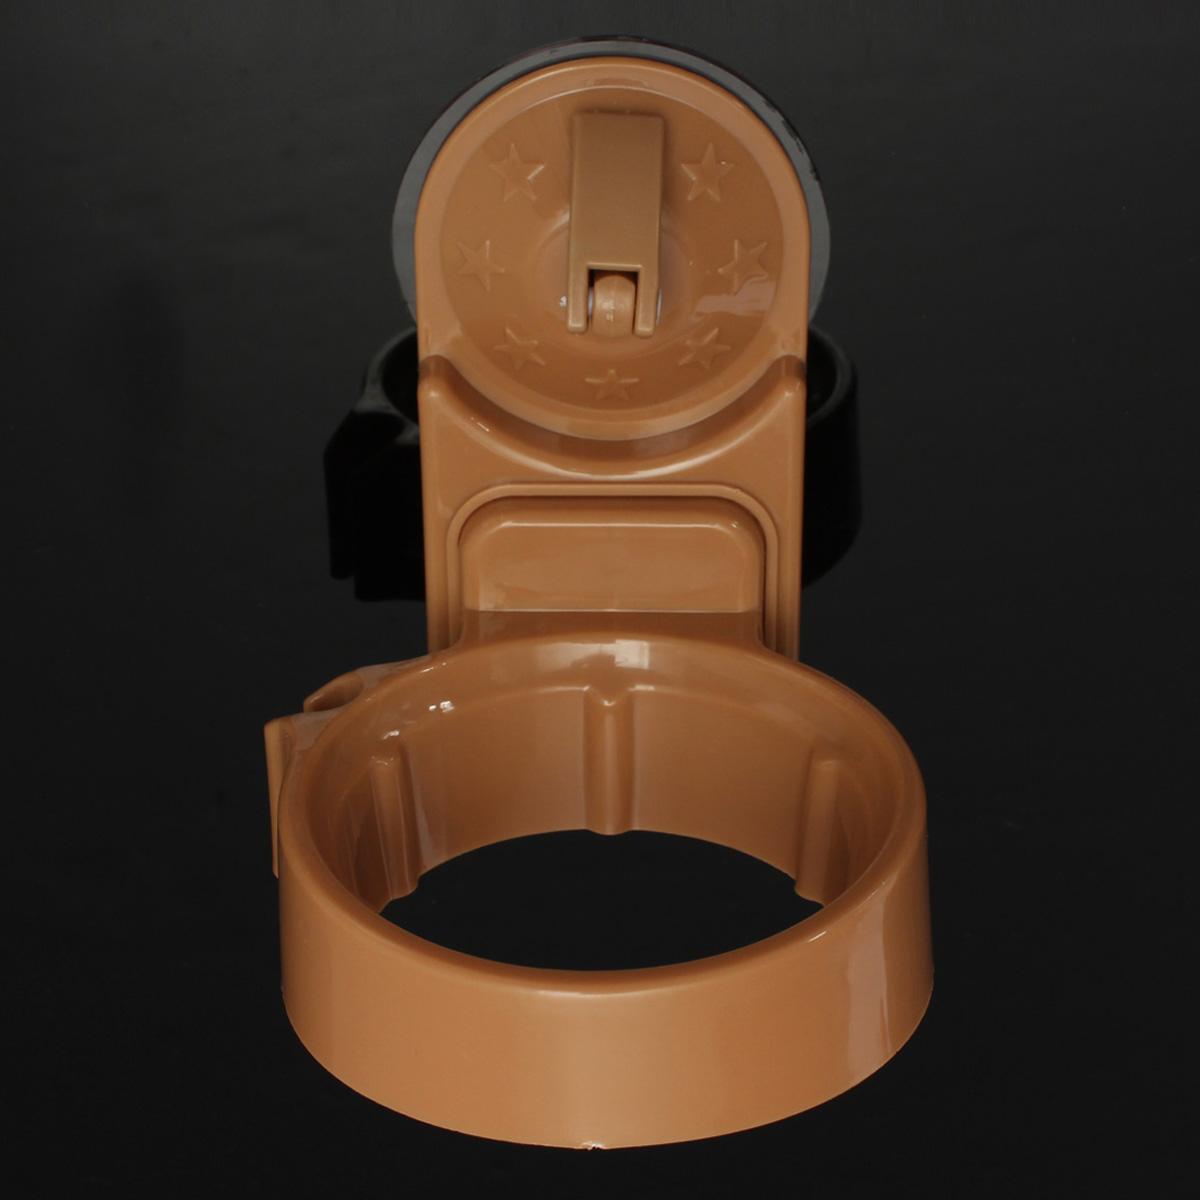 saugnapf f nhalter f nhalterung haartrocknerhalter badezimmer ablage kunststoff ebay. Black Bedroom Furniture Sets. Home Design Ideas